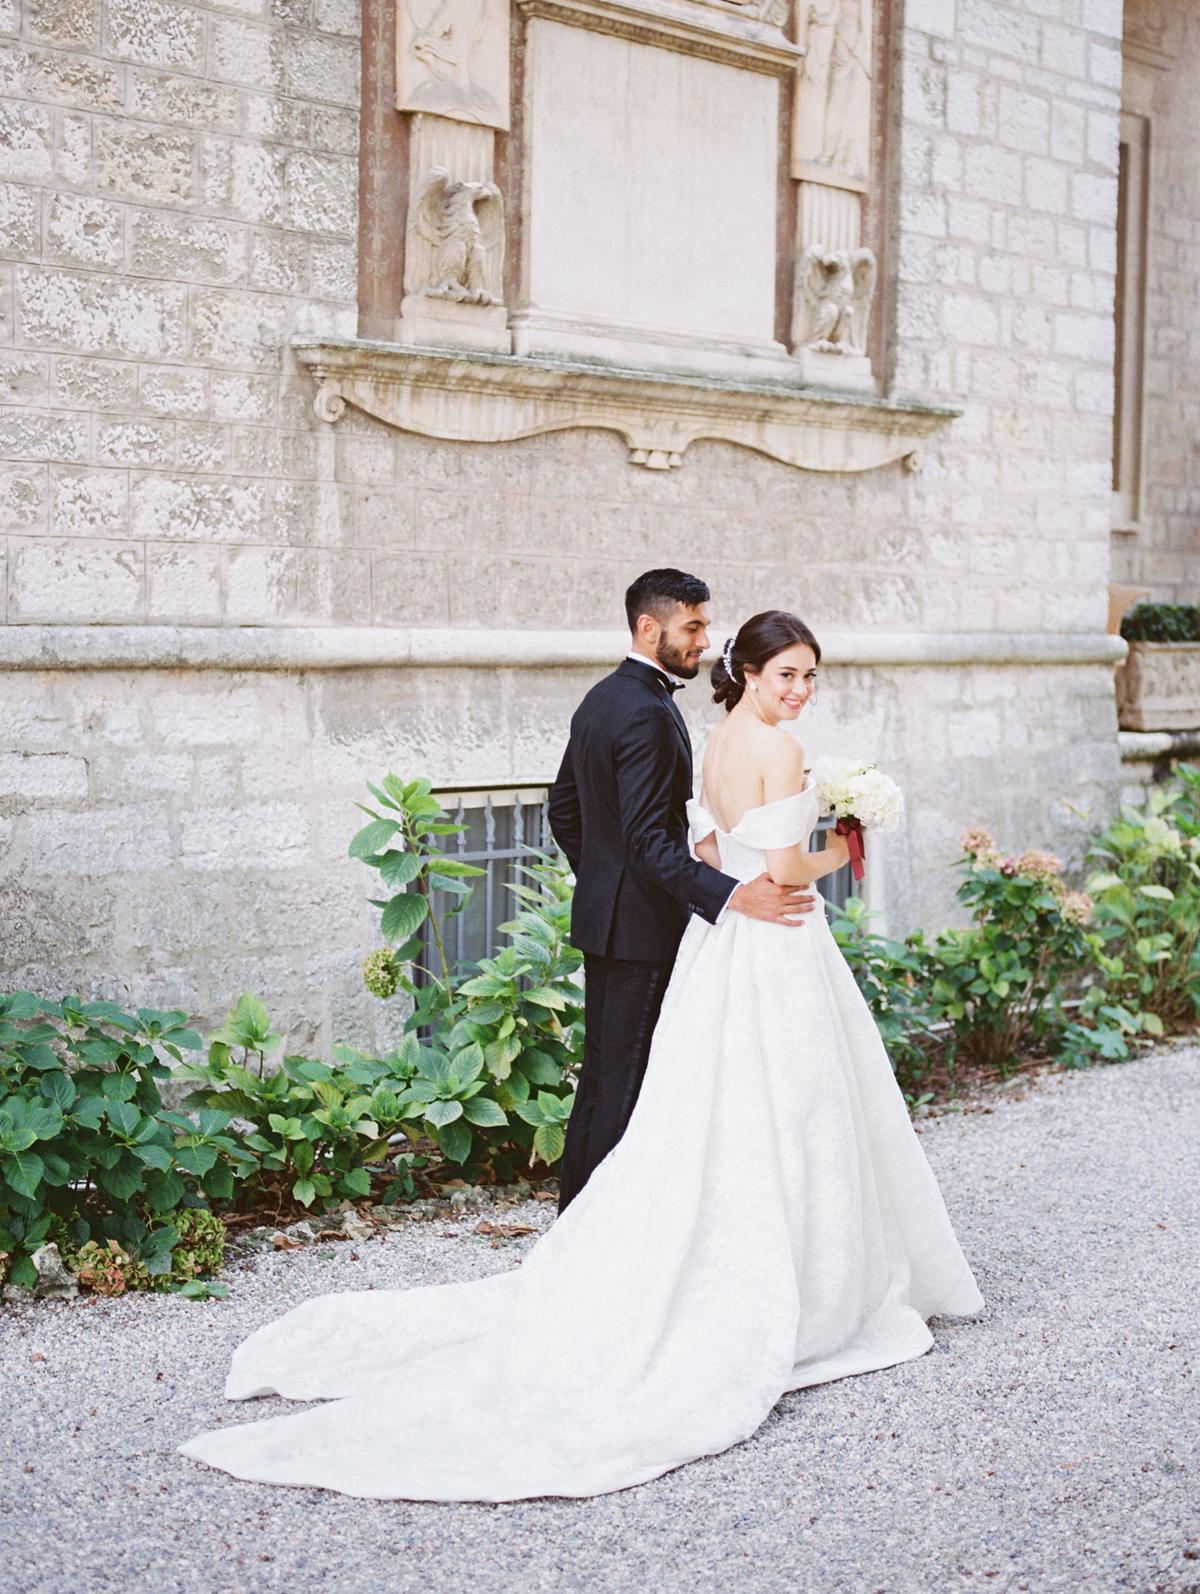 Palace_Villa_Cortine_Hotel_Italian_Wedding_Photographer_Sirmione_AKP-15-Nicole_Khudoyan_Mitchell_Kapoor.jpg